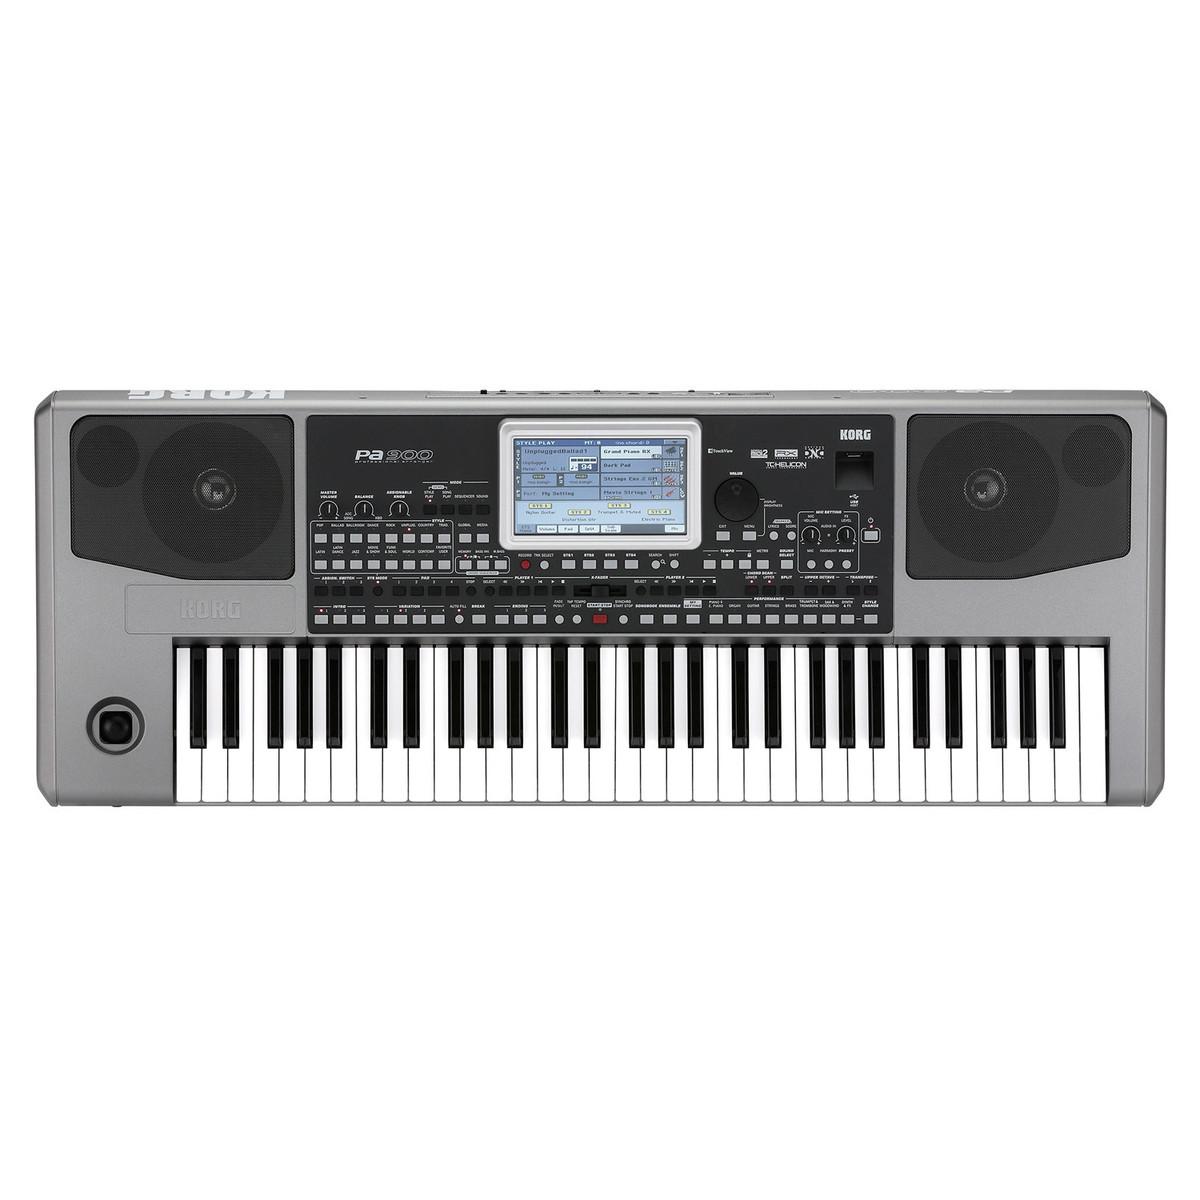 Korg Keyboard Amplifiers : korg pa900 professional arranger keyboard with stand and amplifier at ~ Vivirlamusica.com Haus und Dekorationen